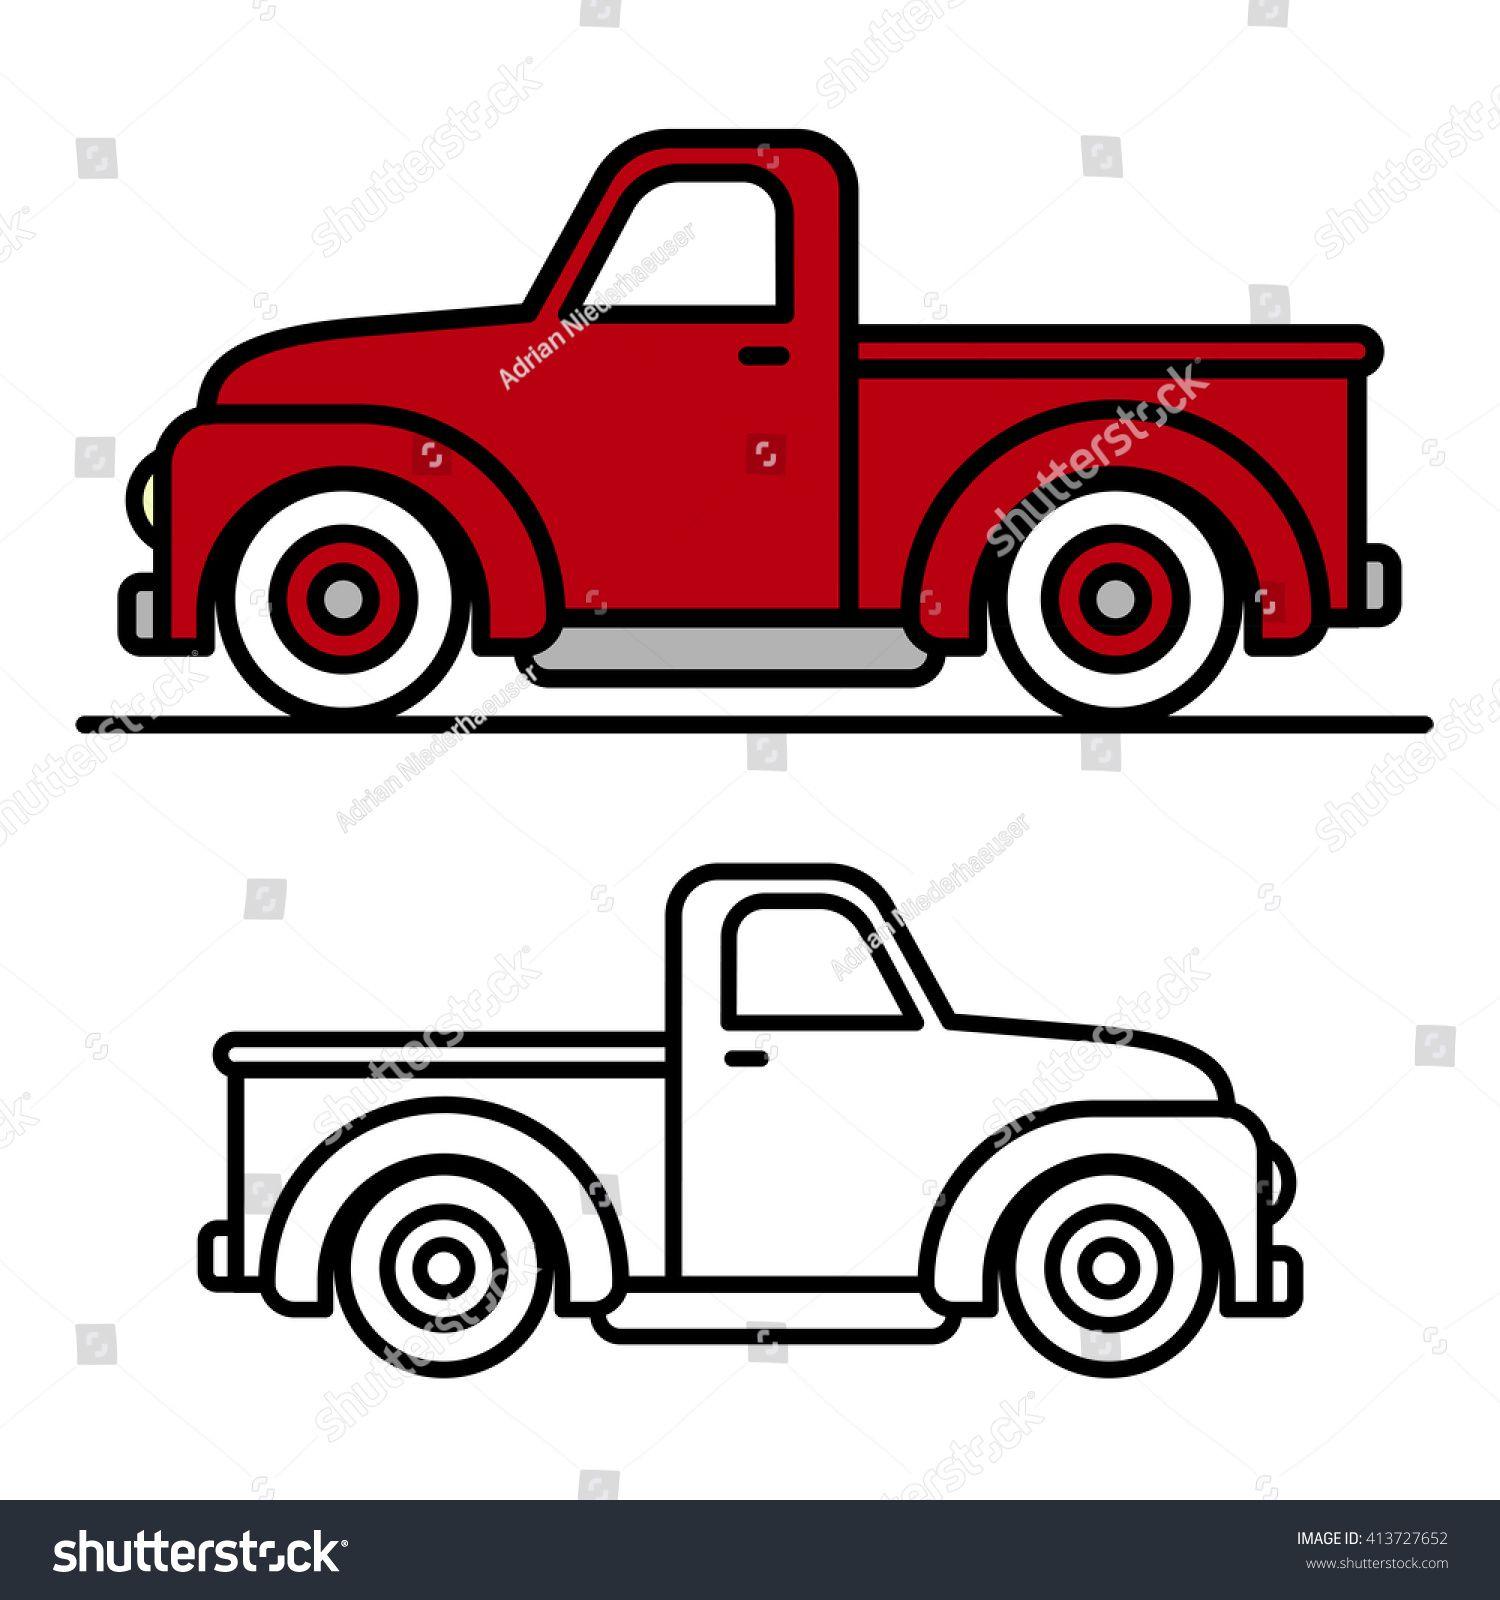 Two cartoon vintage pickup truck outline drawings, one